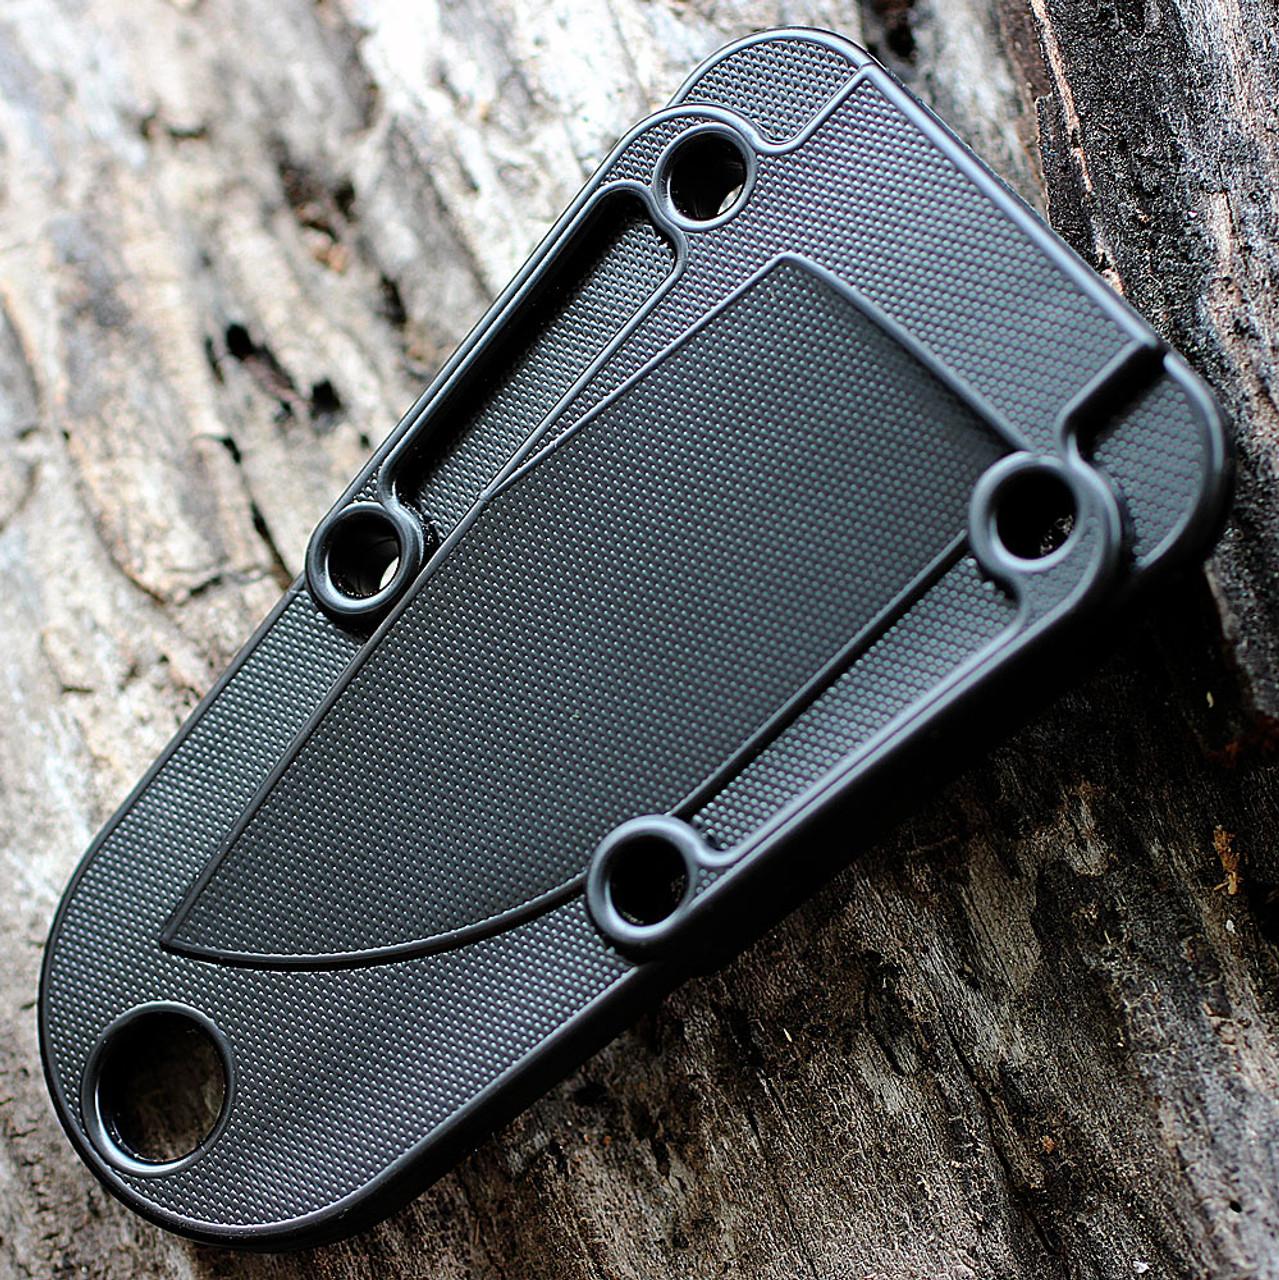 ESEE Izula II Tactical Gray Knife and Sheath with Kit